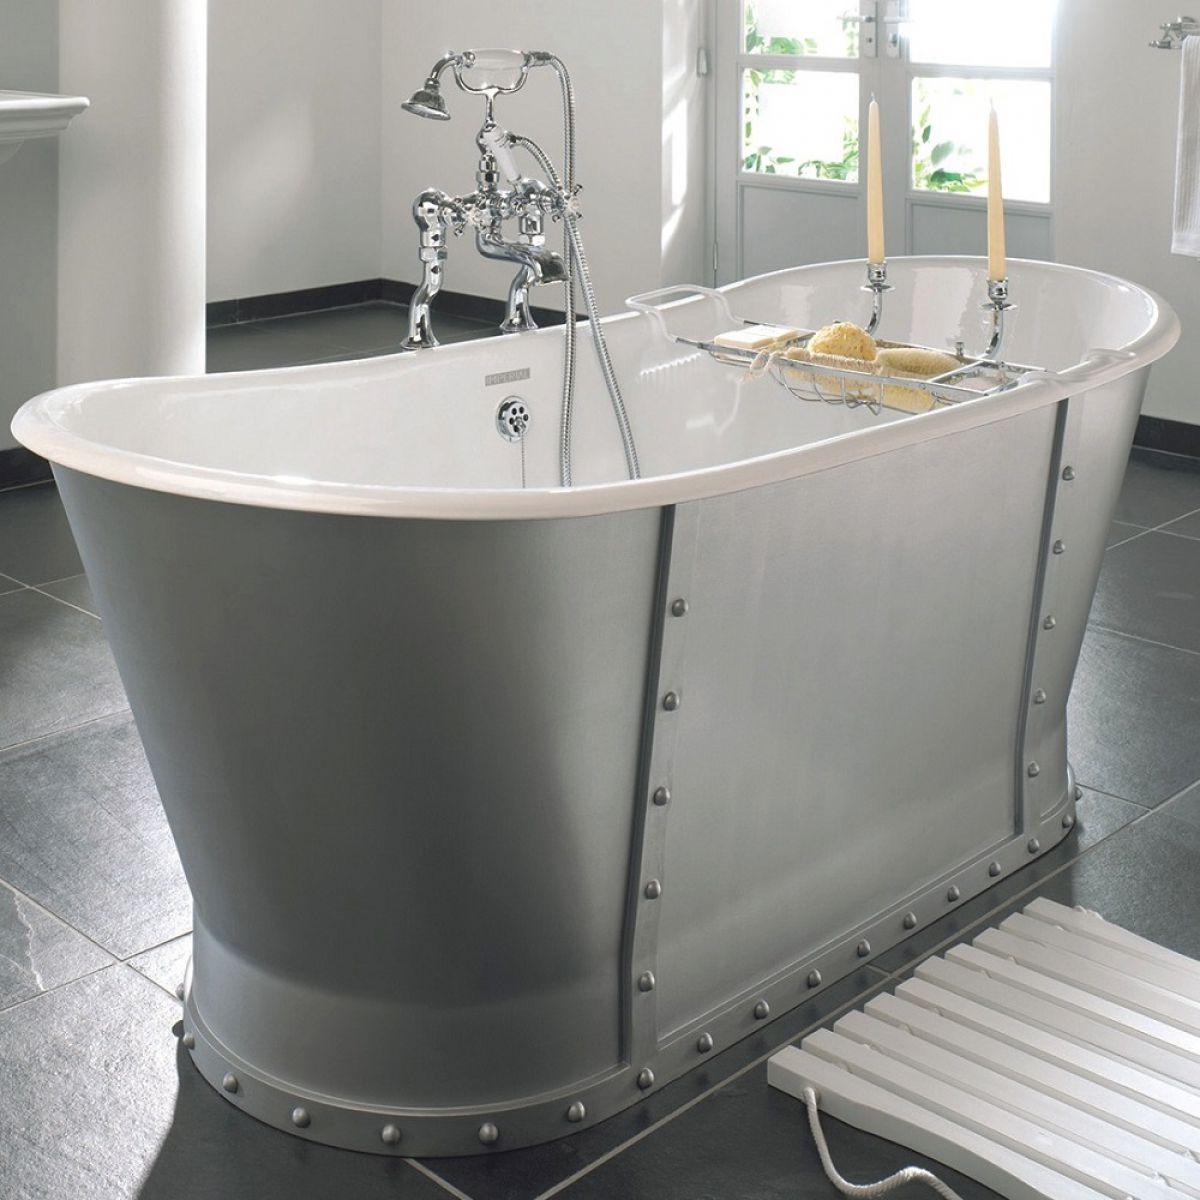 Banburgh Cast Iron Bath: Imperial Baglioni Cast Iron Bath : UK Bathrooms